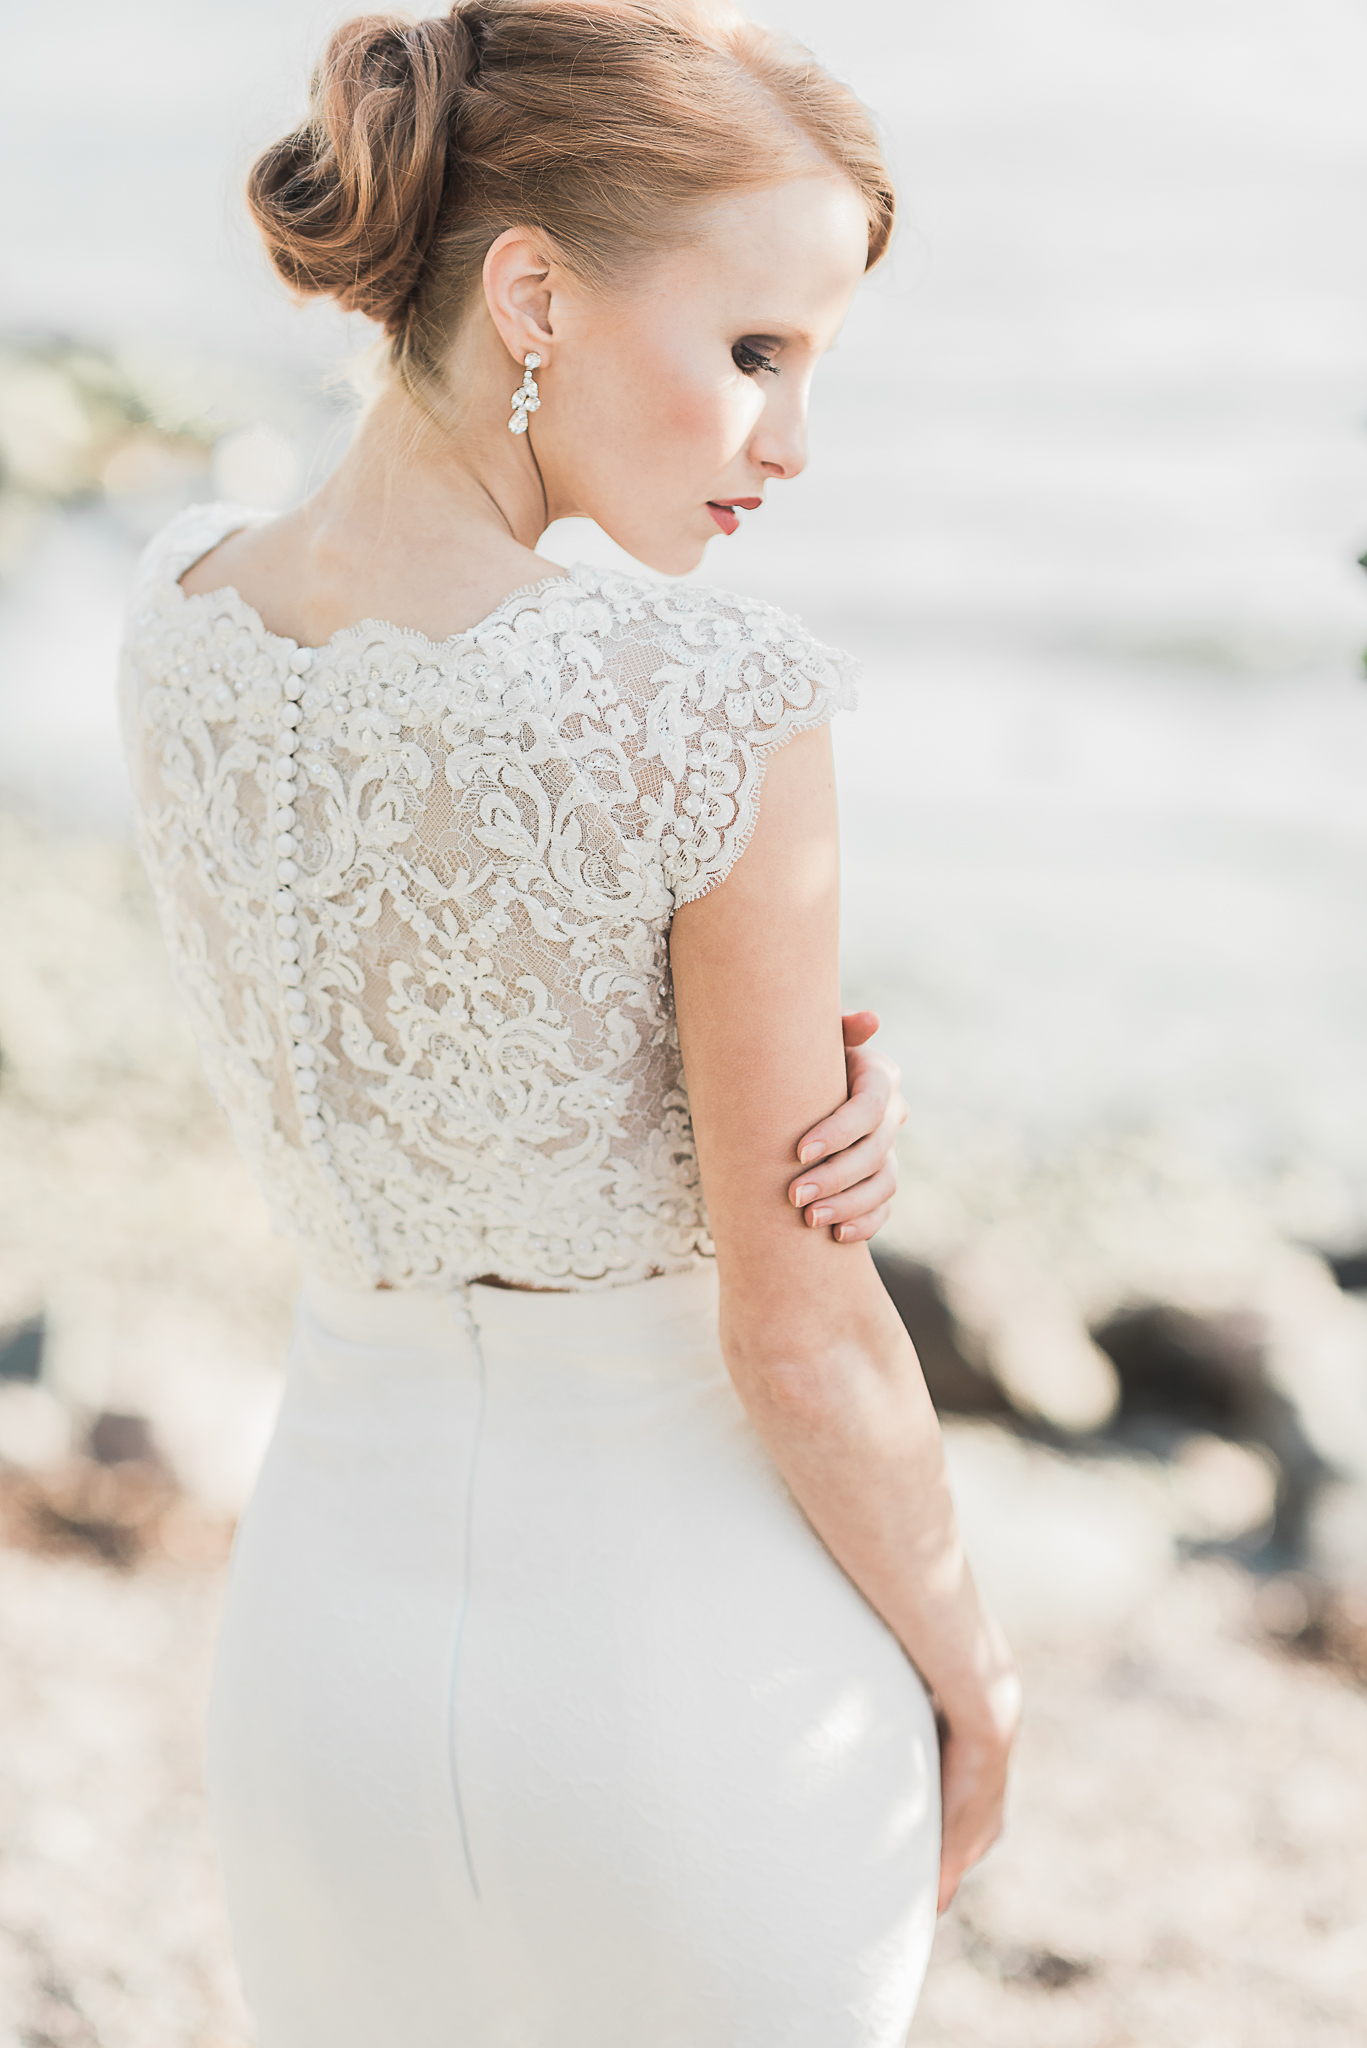 Dress Made using Ava Lace